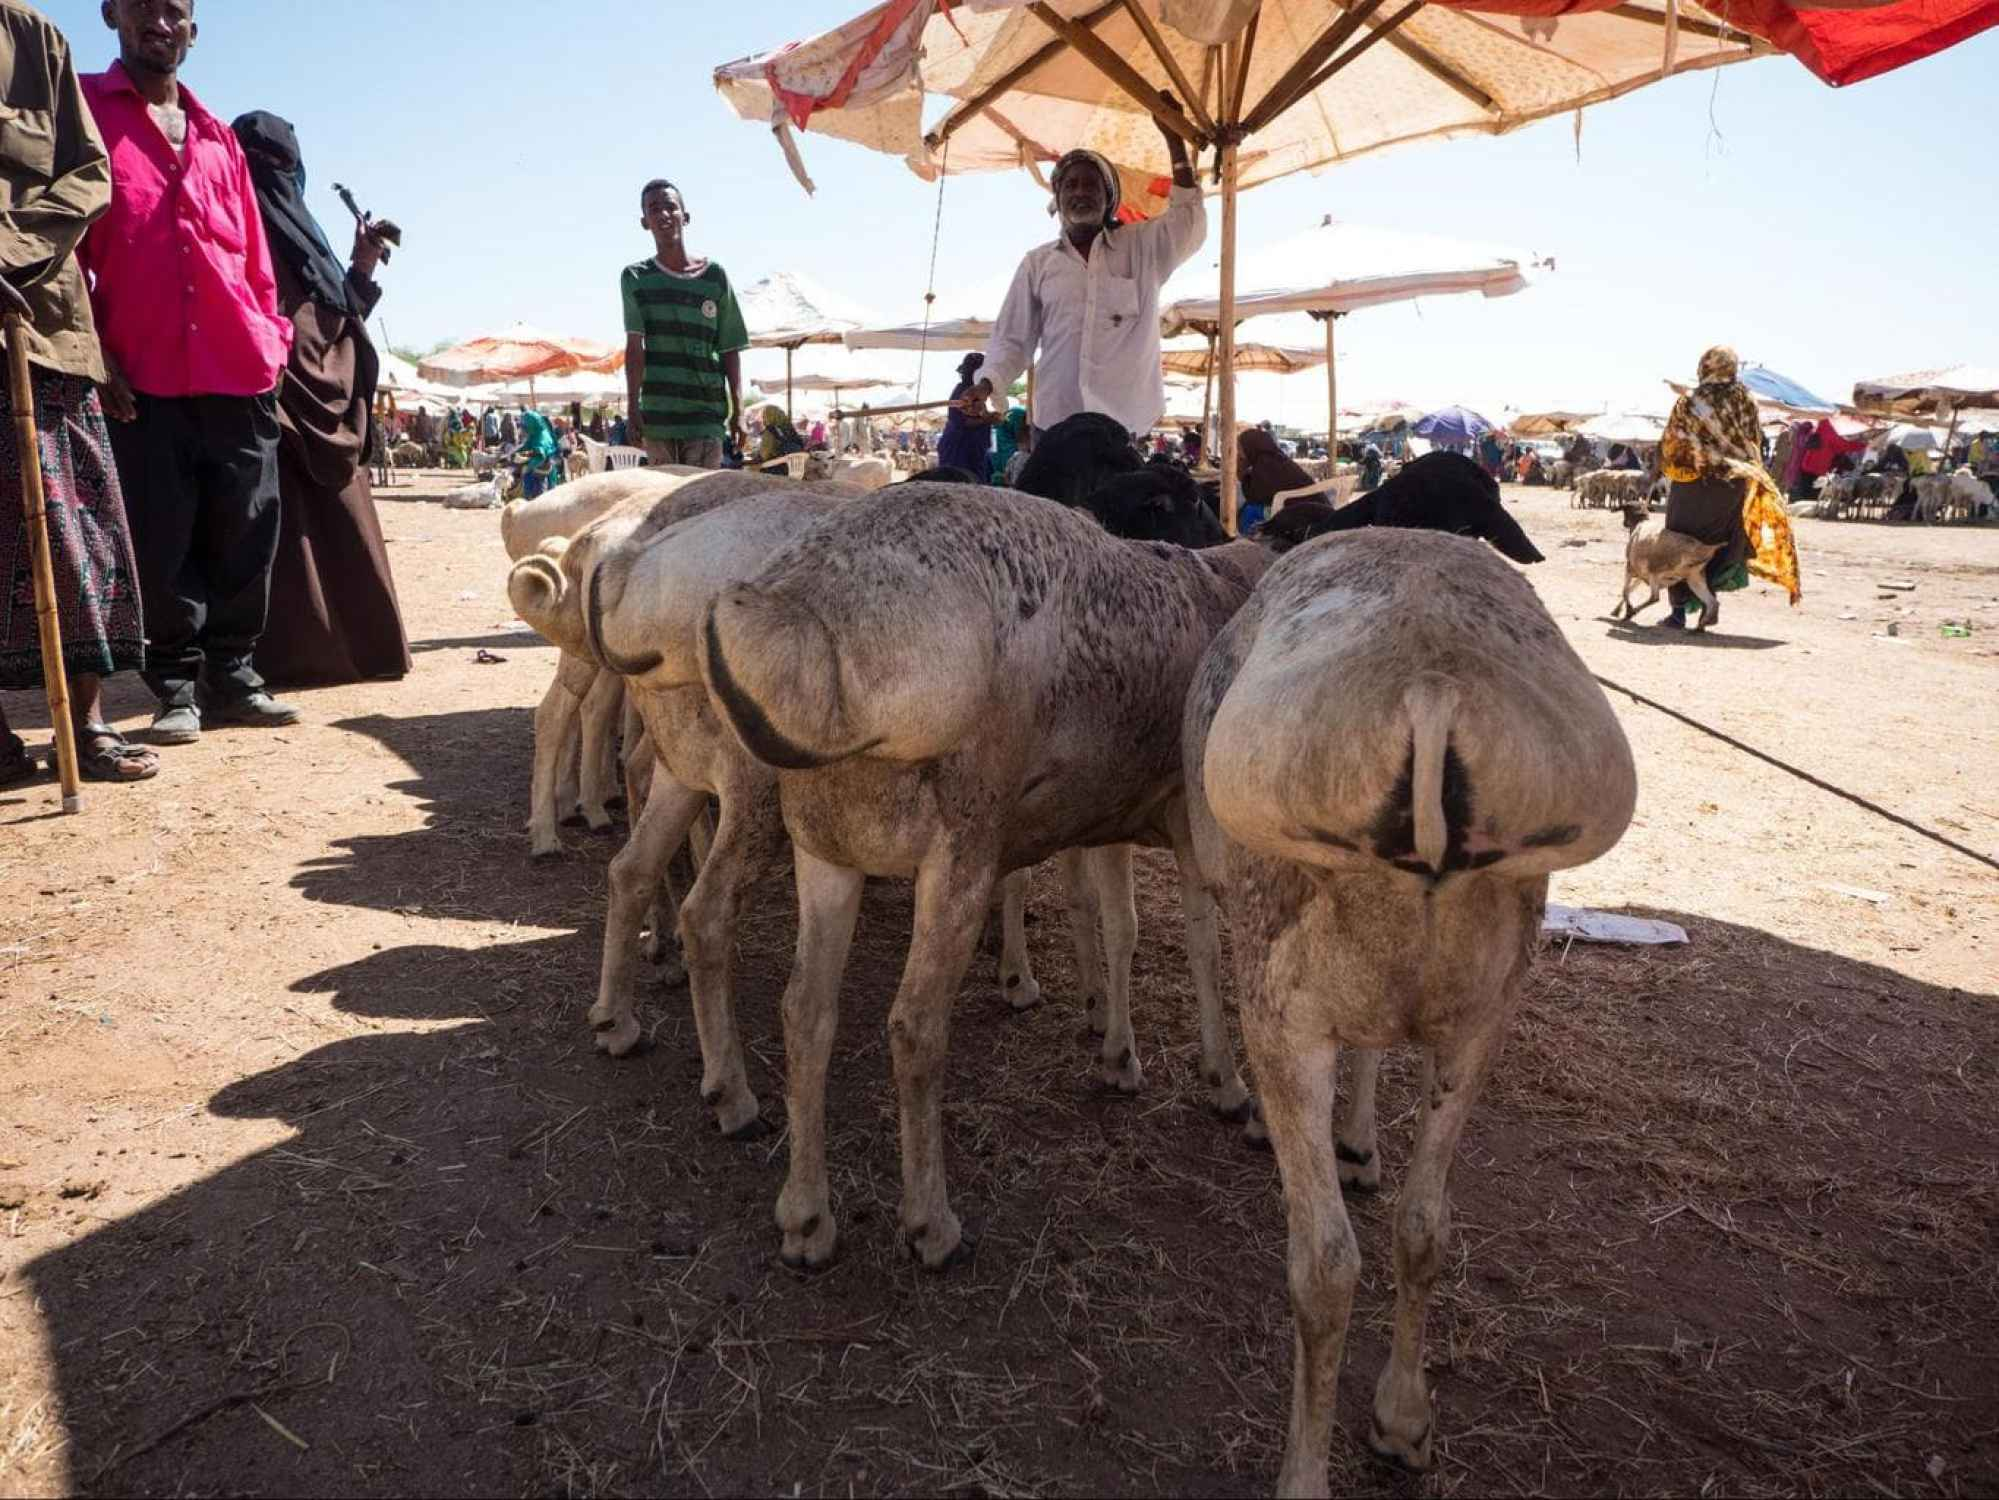 Somali goats at the Hargeisa livestock market